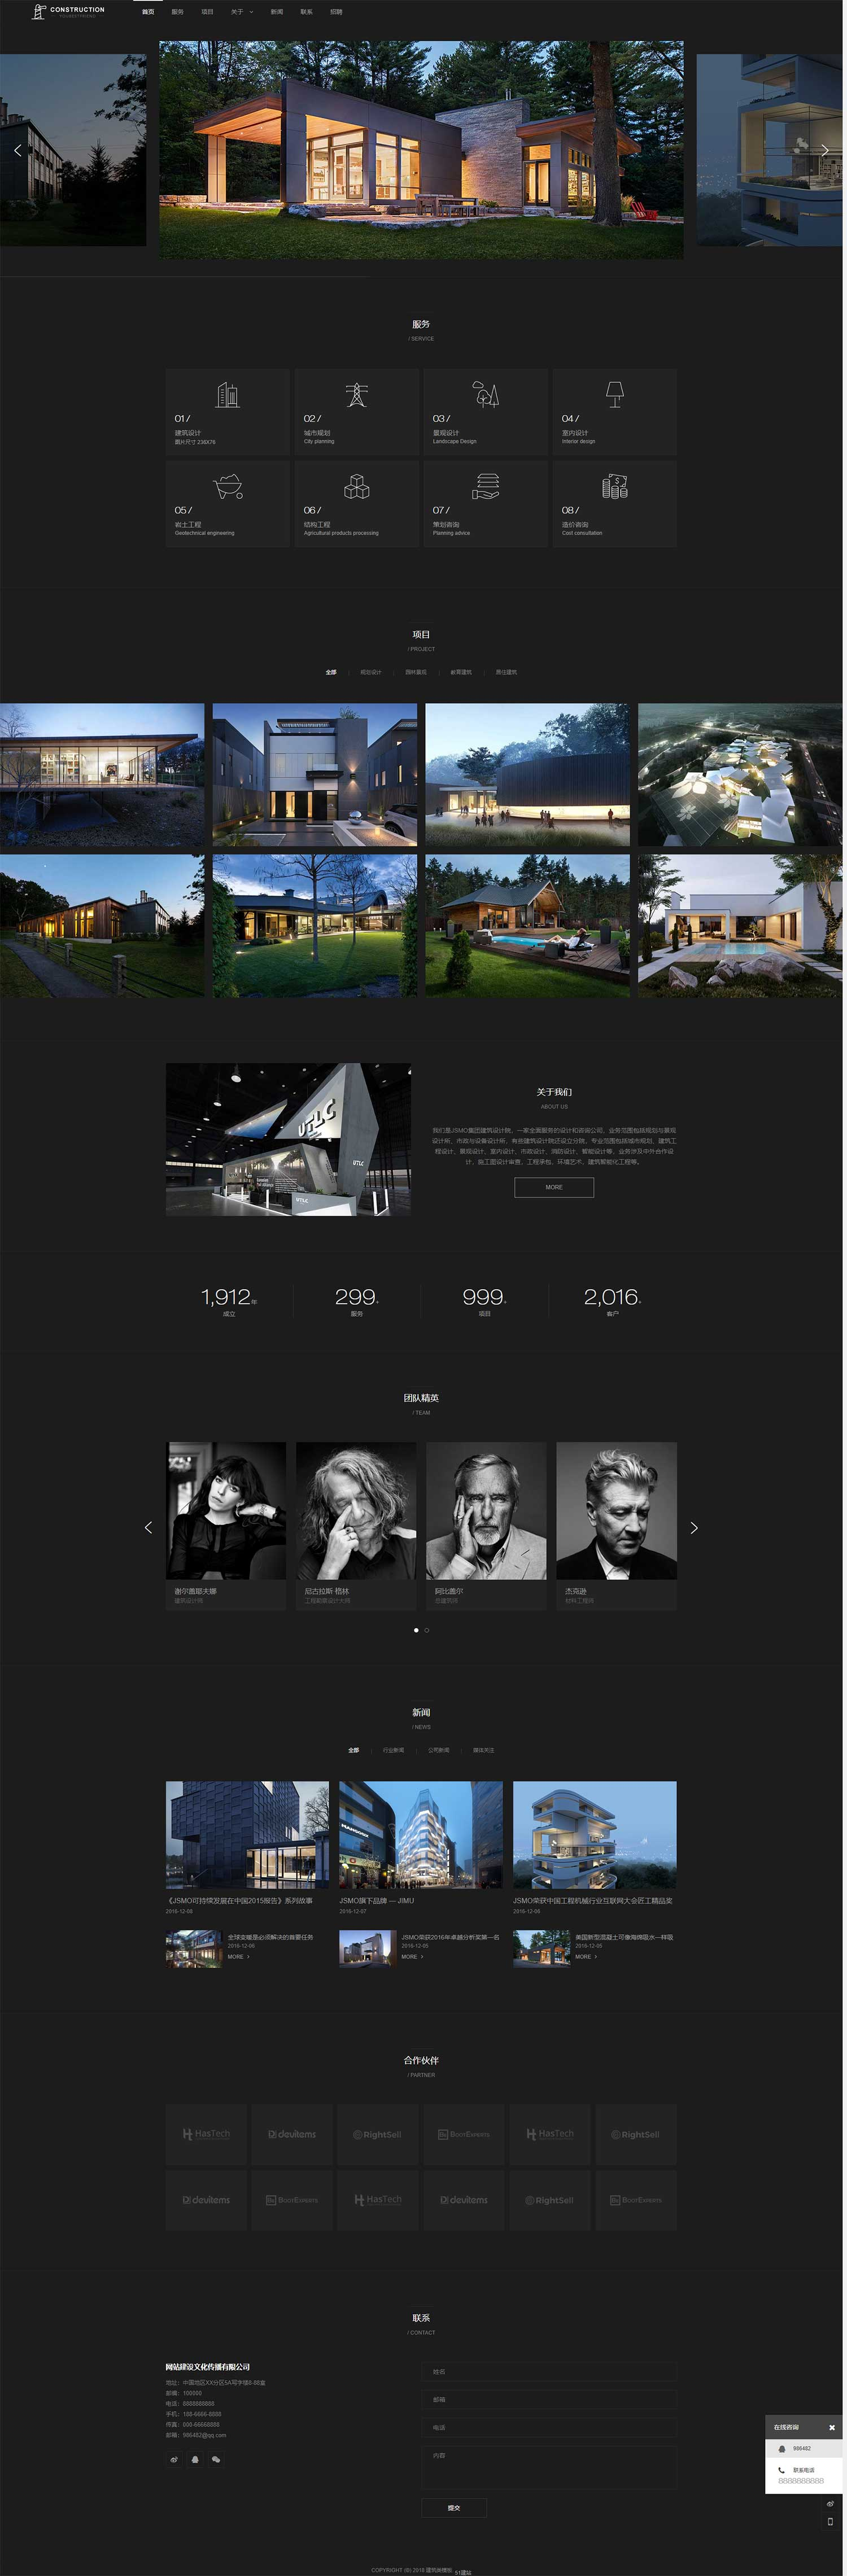 html5黑色大气的建筑设计行业网站模板